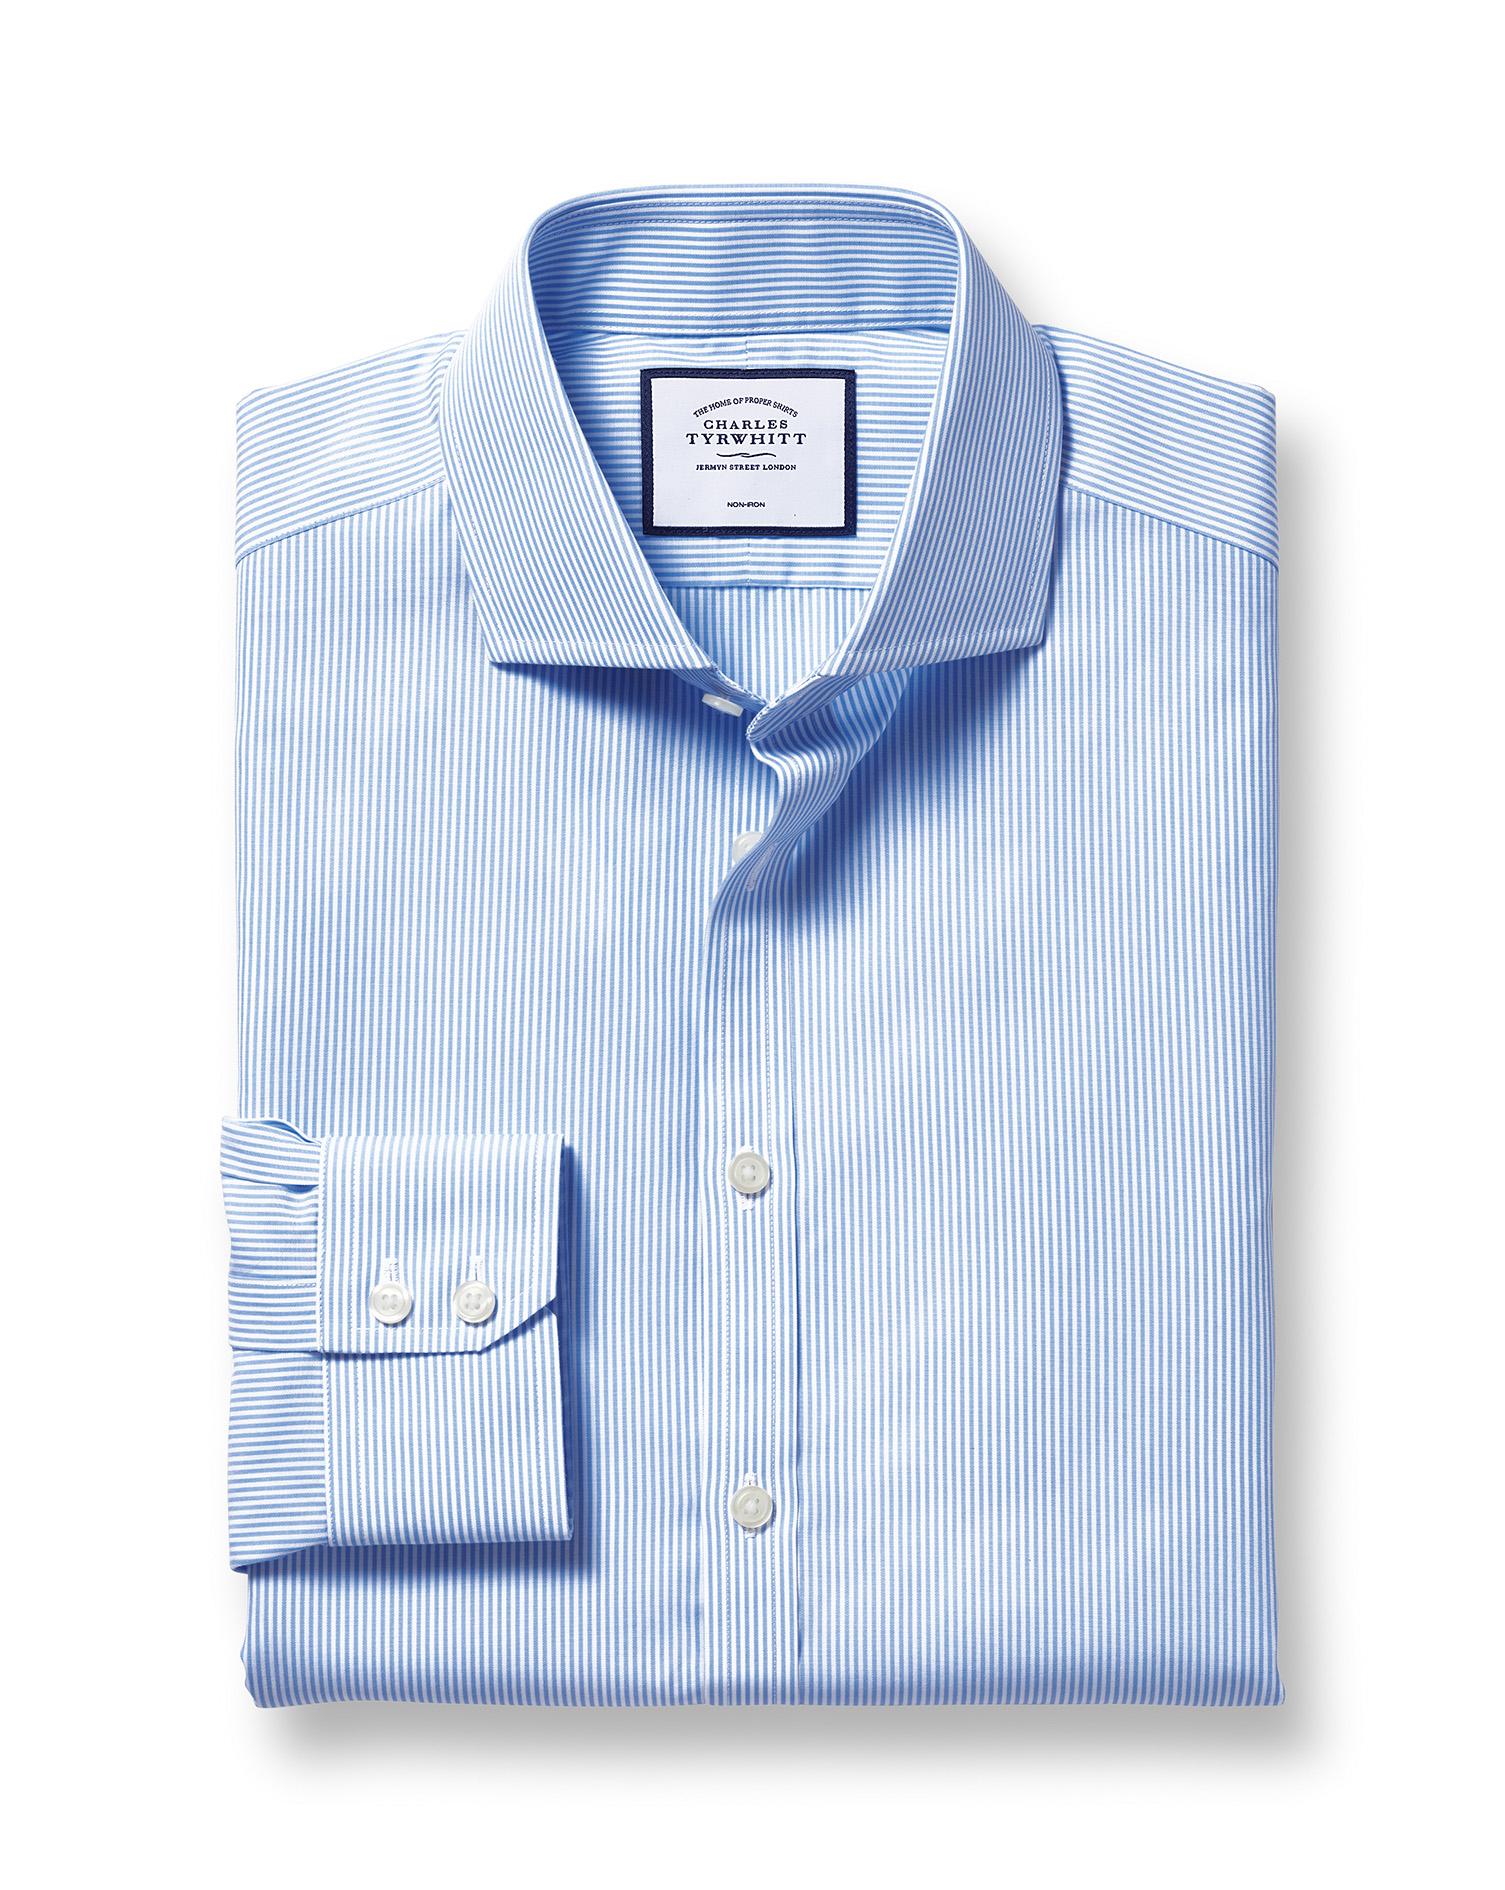 Extra Slim Fit Cutaway Non-Iron Bengal Stripe Sky Blue Cotton Formal Shirt Single Cuff Size 16.5/36